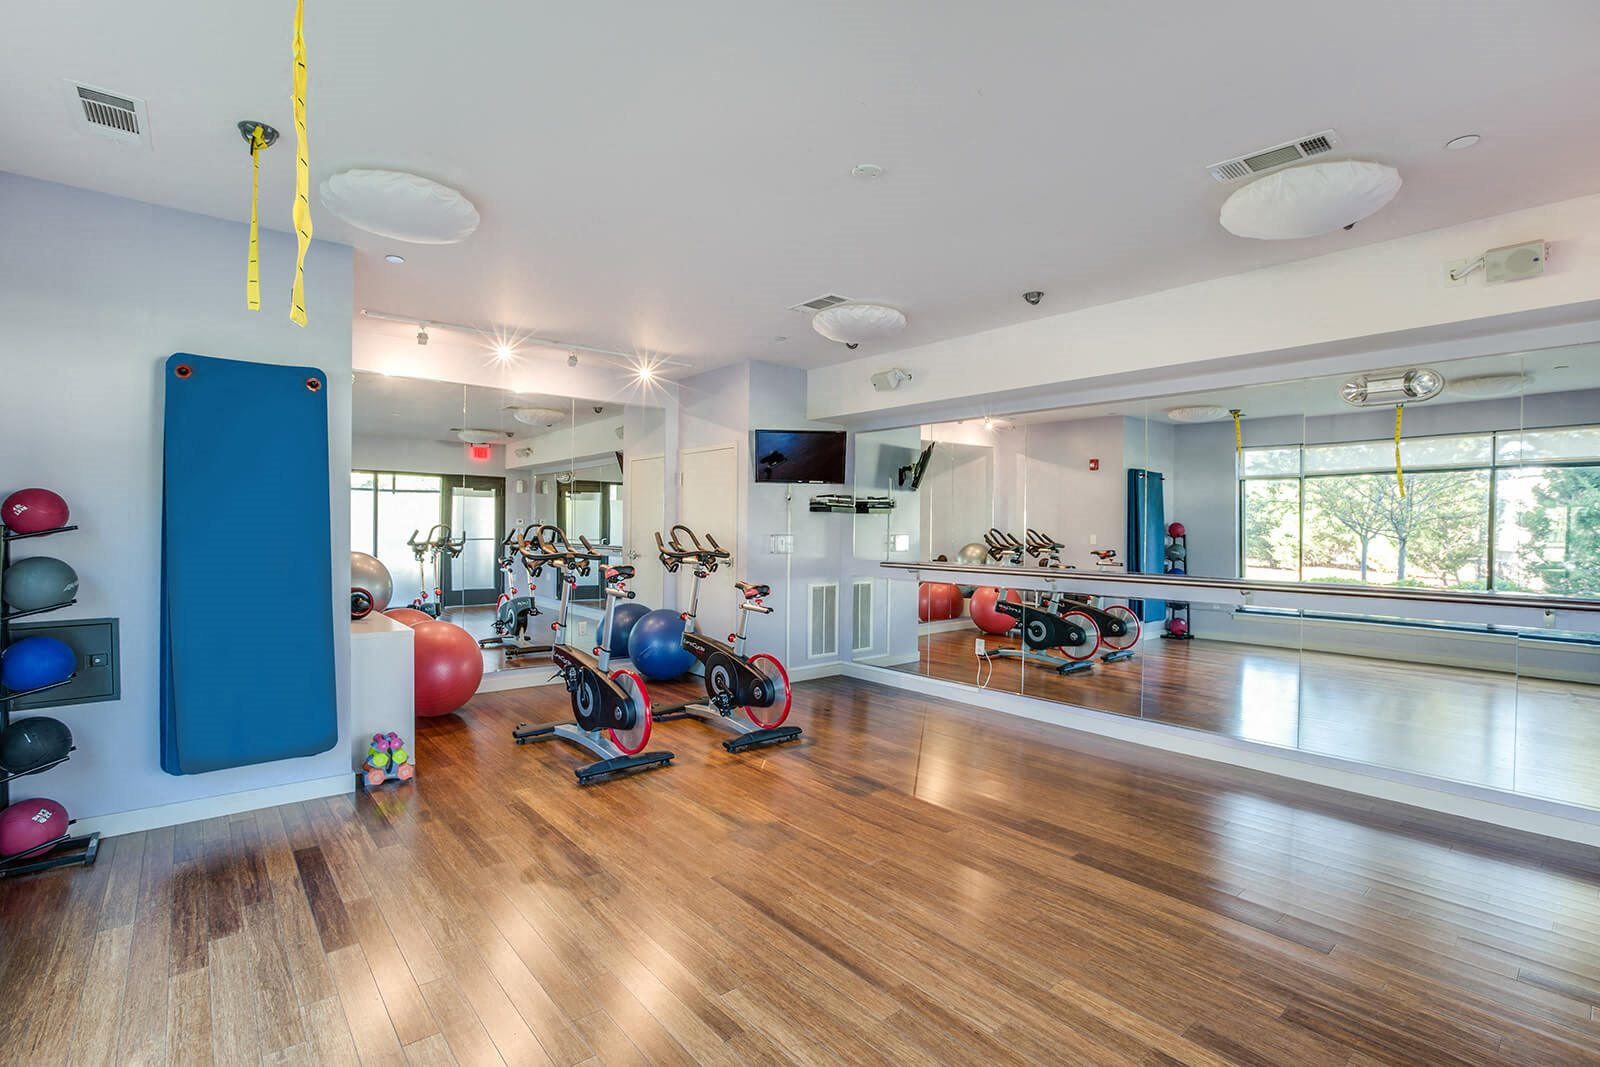 Yoga, Barre, and Peloton Spin Studio at Windsor at Maxwells Green, 02144, MA